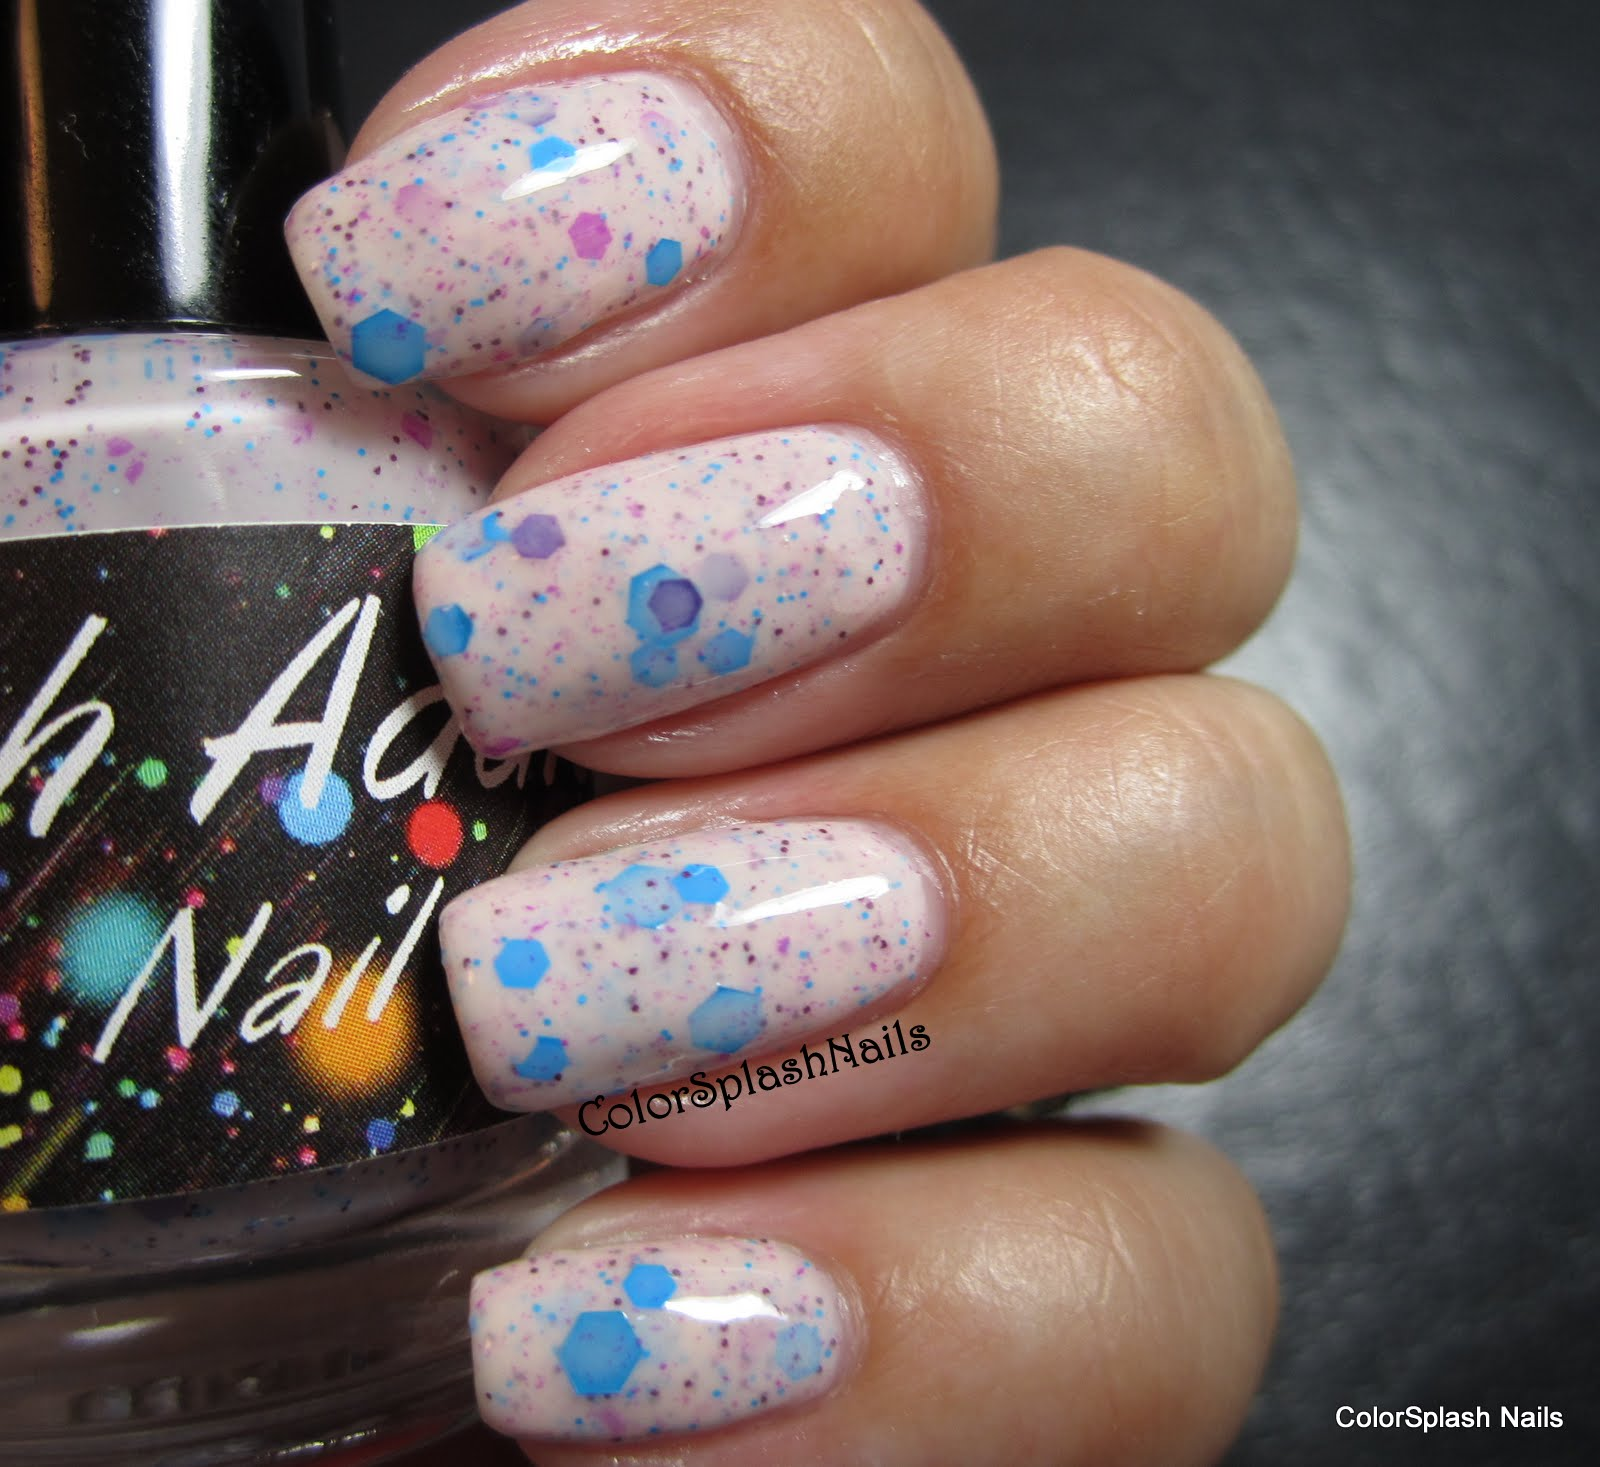 Colorsplash Nails: Polish Addict Nail Polish Sand & Surf and Happy Hour